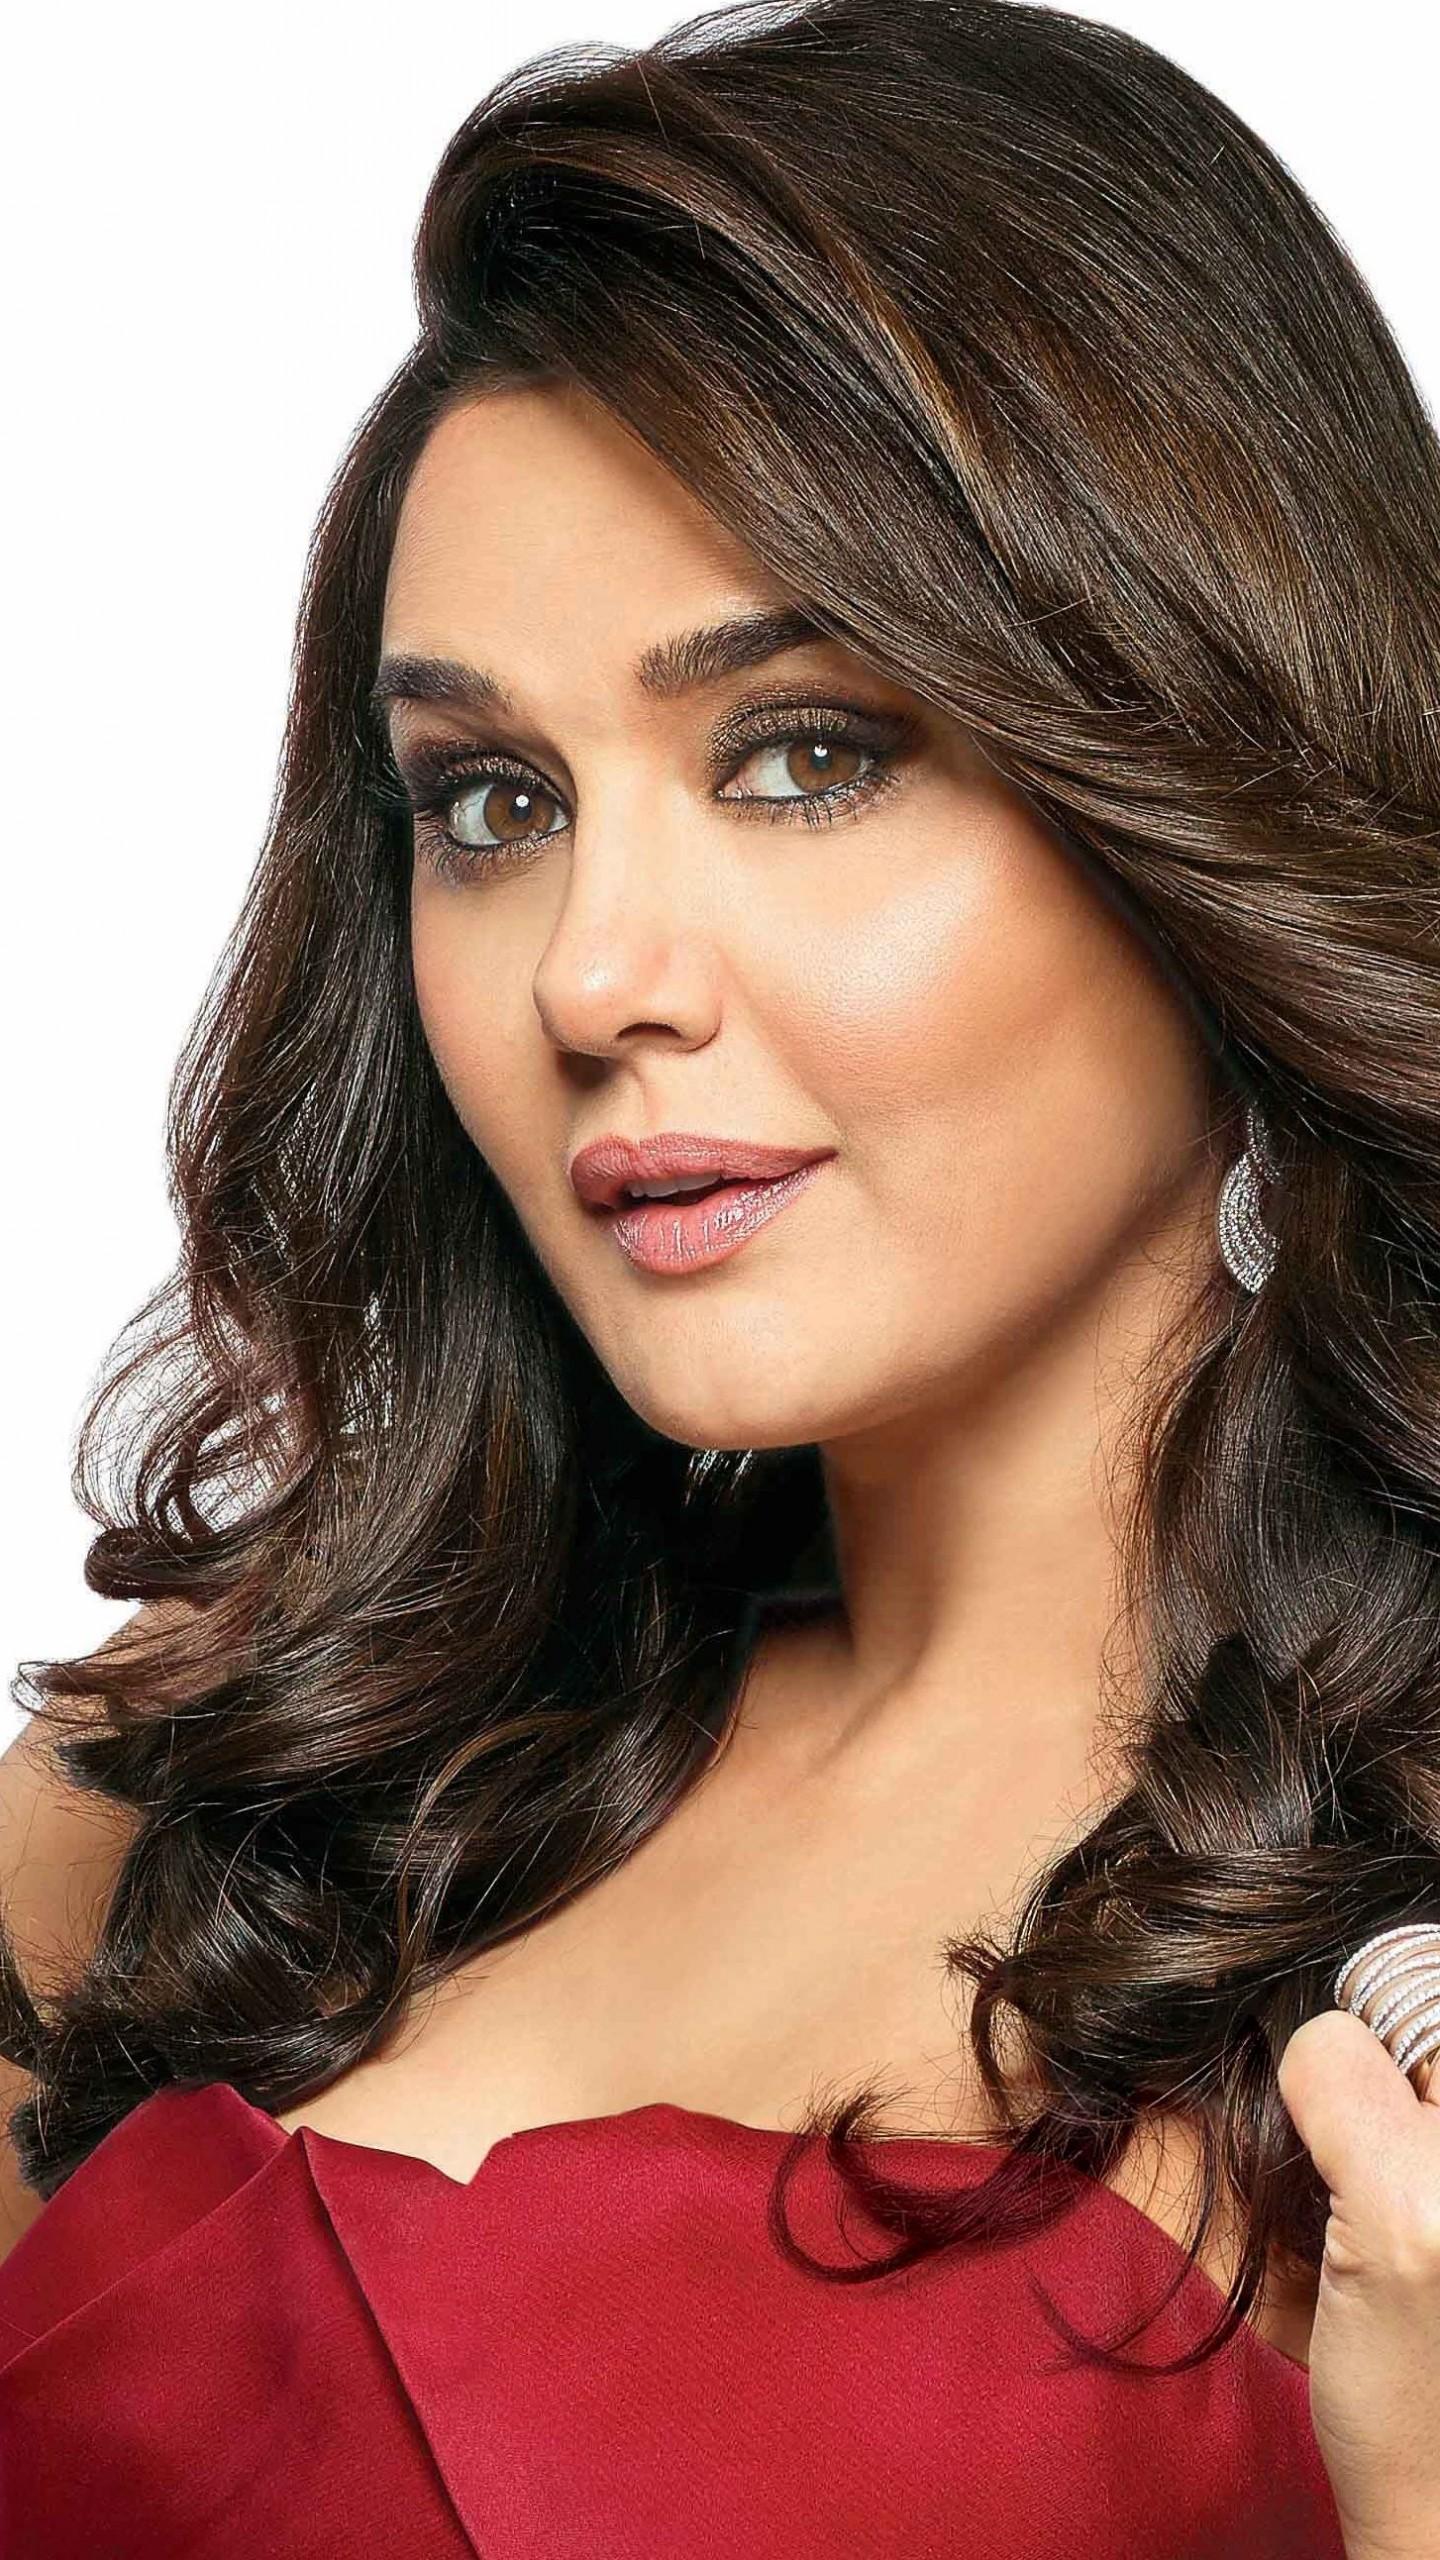 33 Best preityzinta images | Preity zinta, Bollywood ...